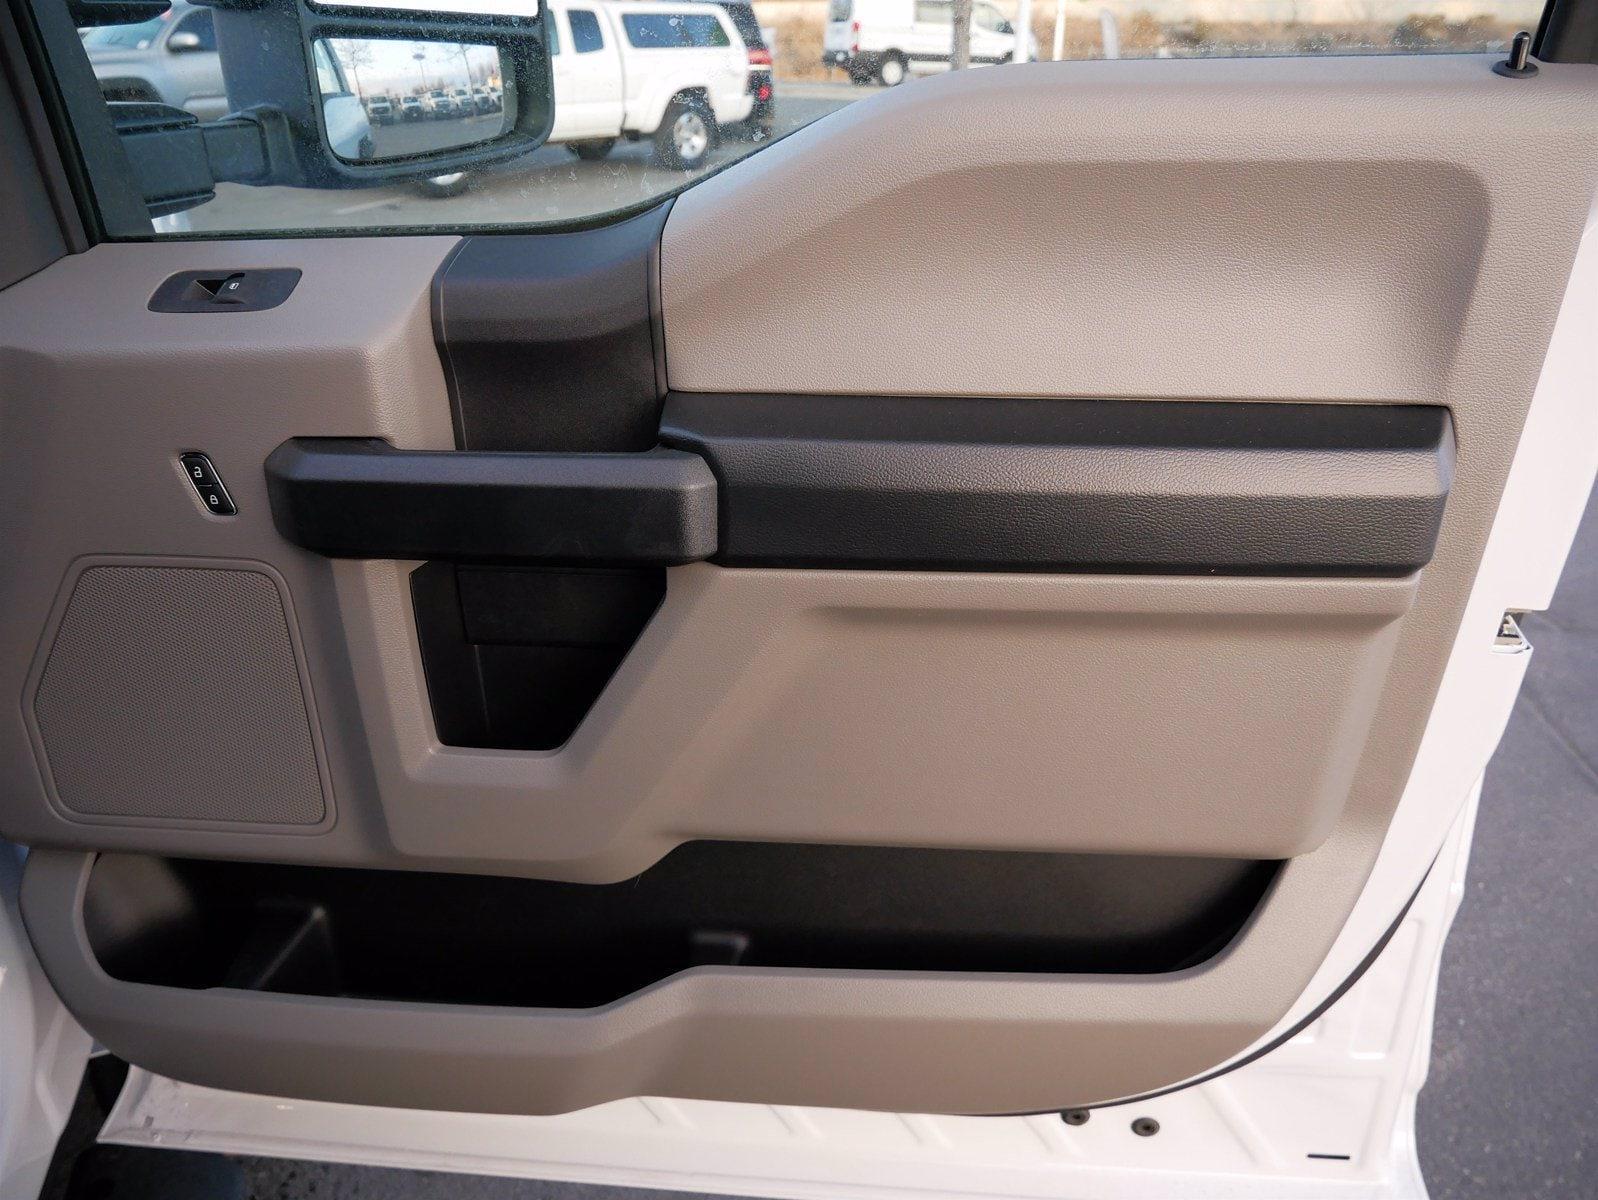 2020 Ford F-550 Regular Cab DRW 4x4, Scelzi Dump Body #63233 - photo 24